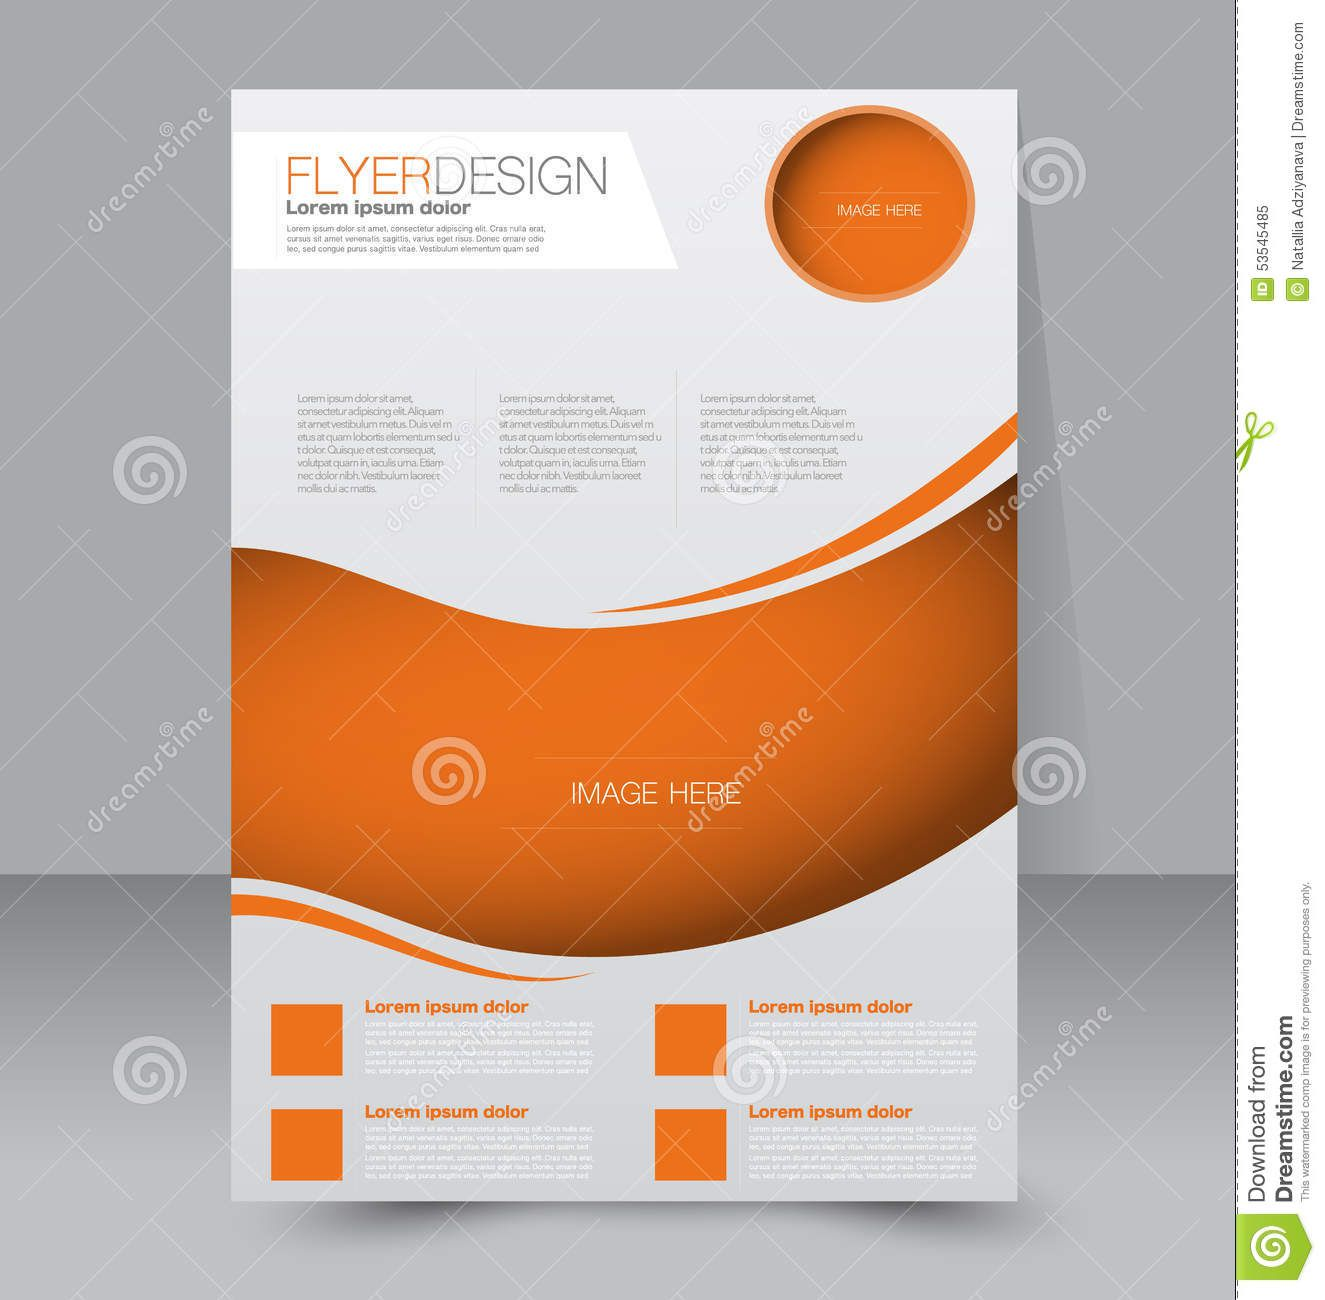 009 Impressive Free Editable Flyer Template High Definition  Busines FundraisingFull